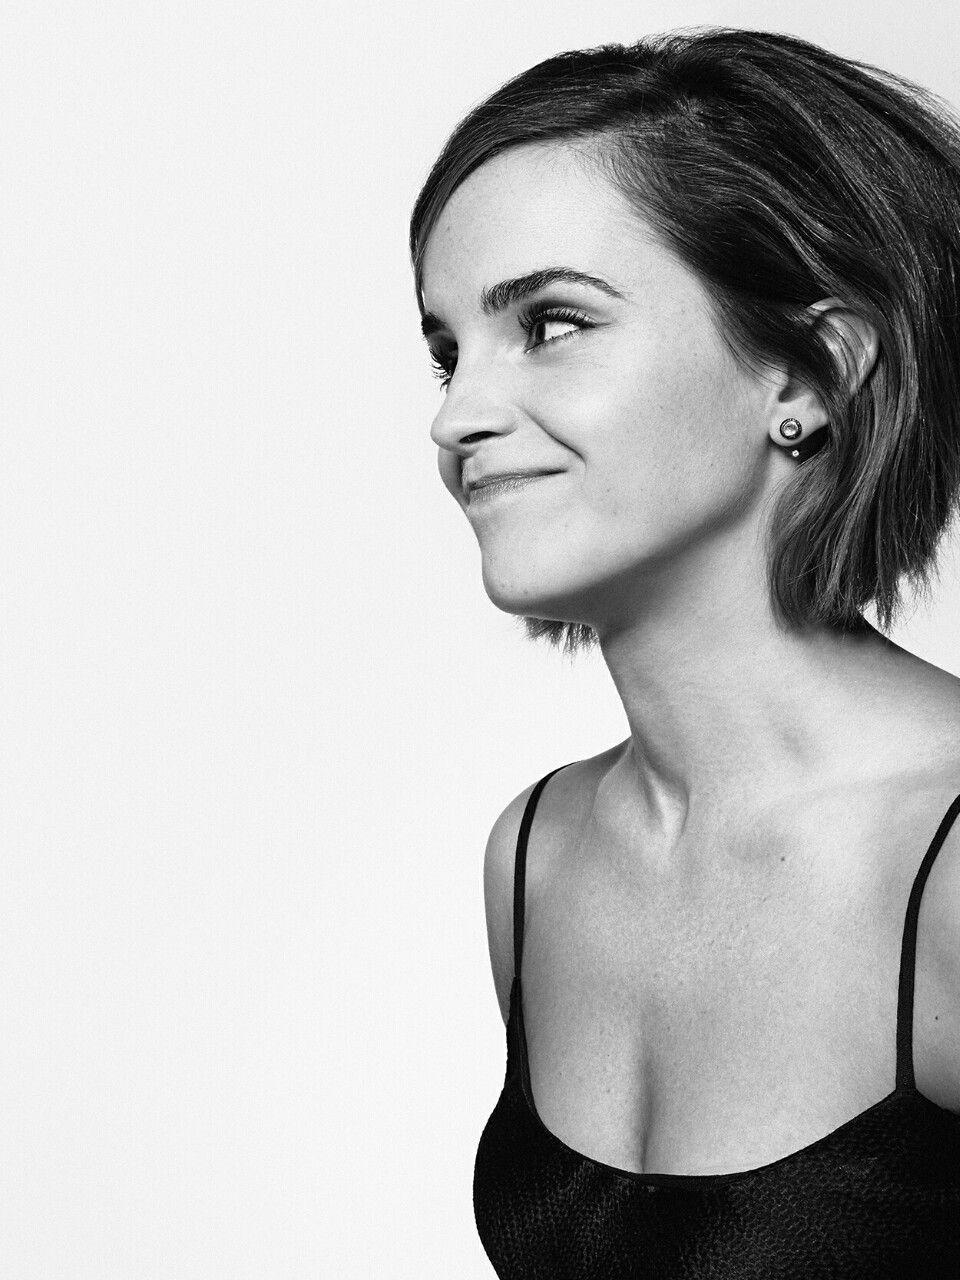 Emma Watson Kn0wy0u Cool Hair Pinterest Bobs Angled Bobs And